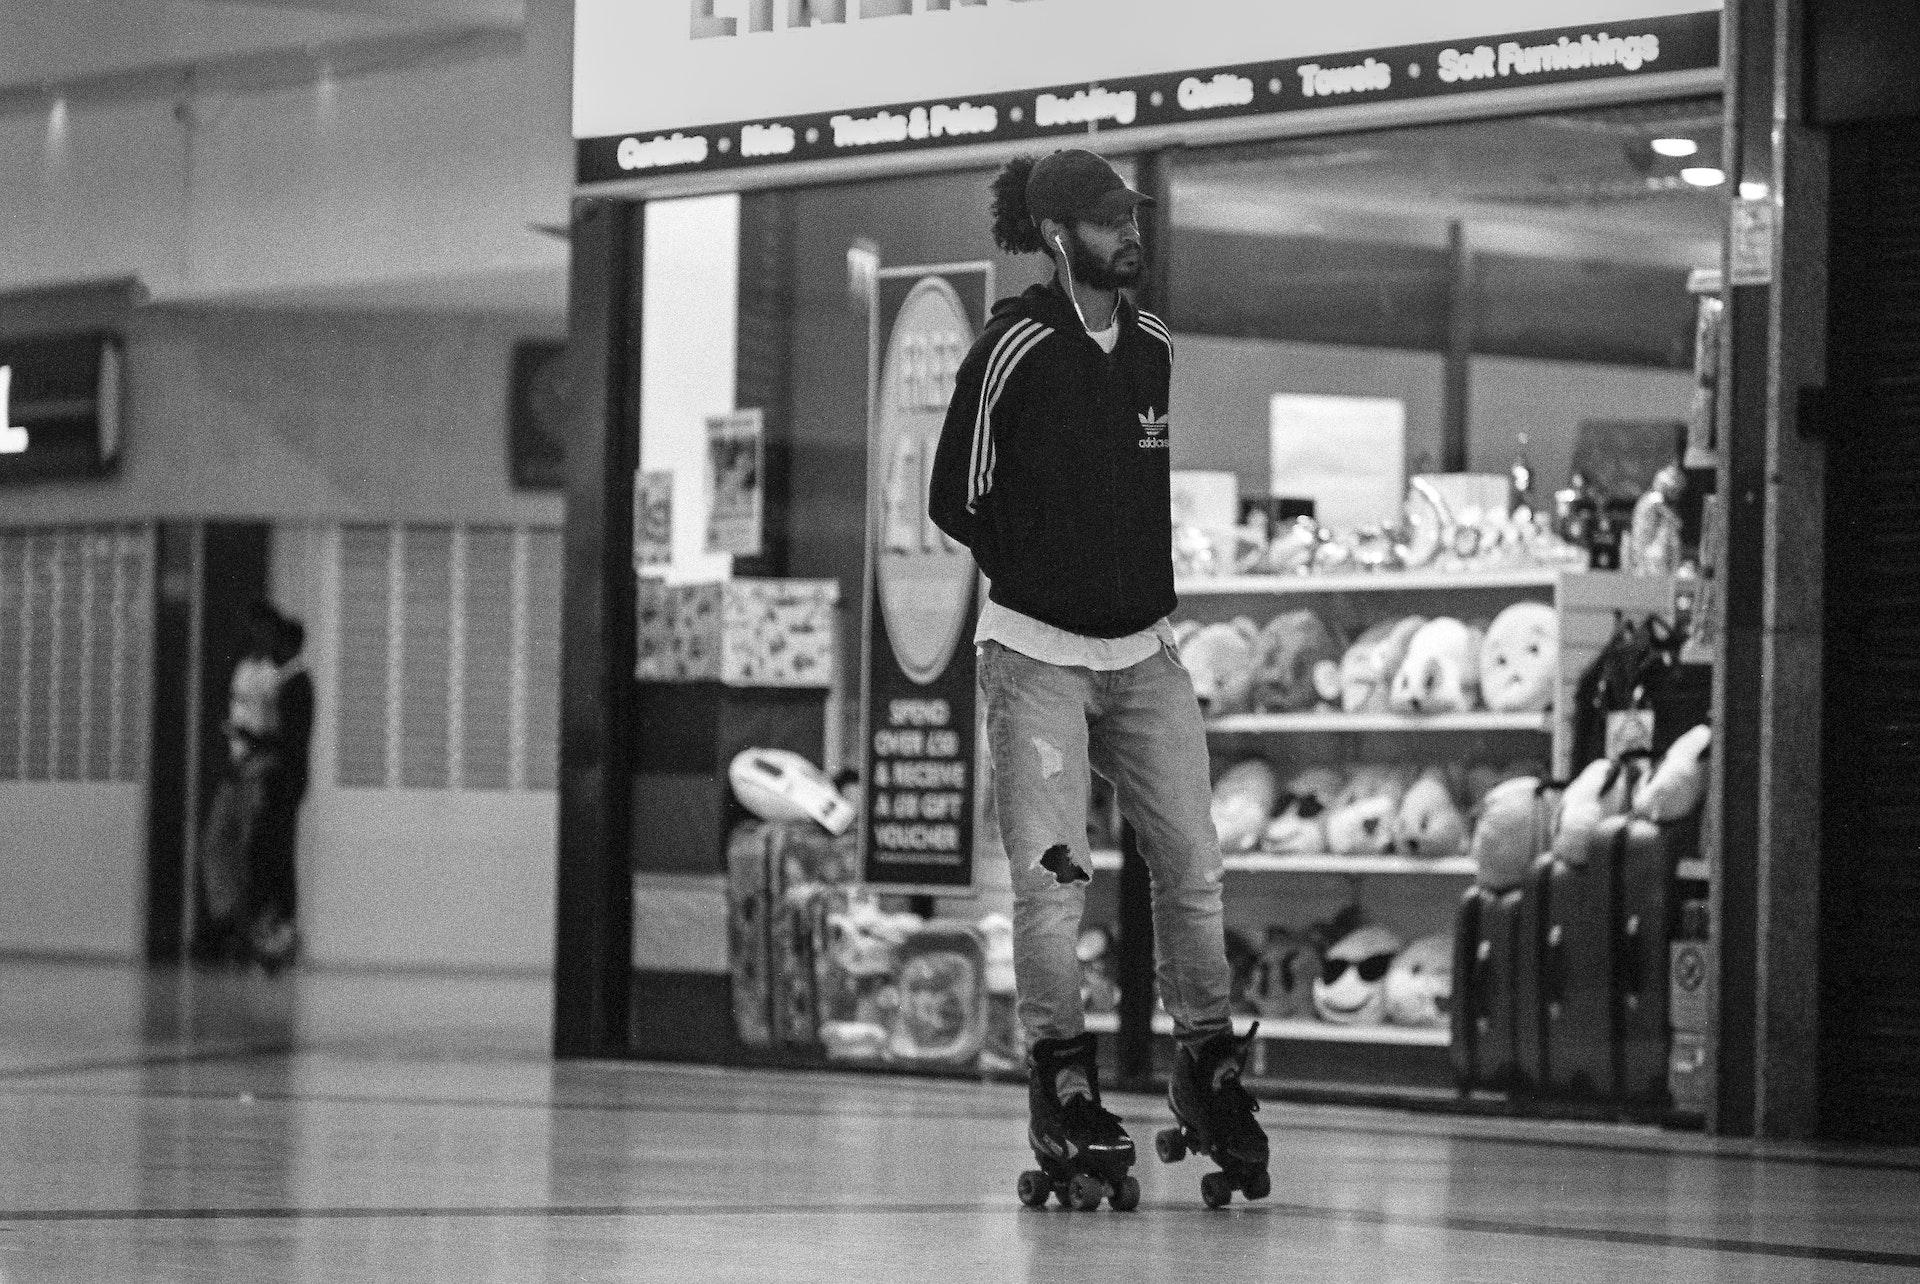 Stratford_Centre_Skaters_Lighter-35